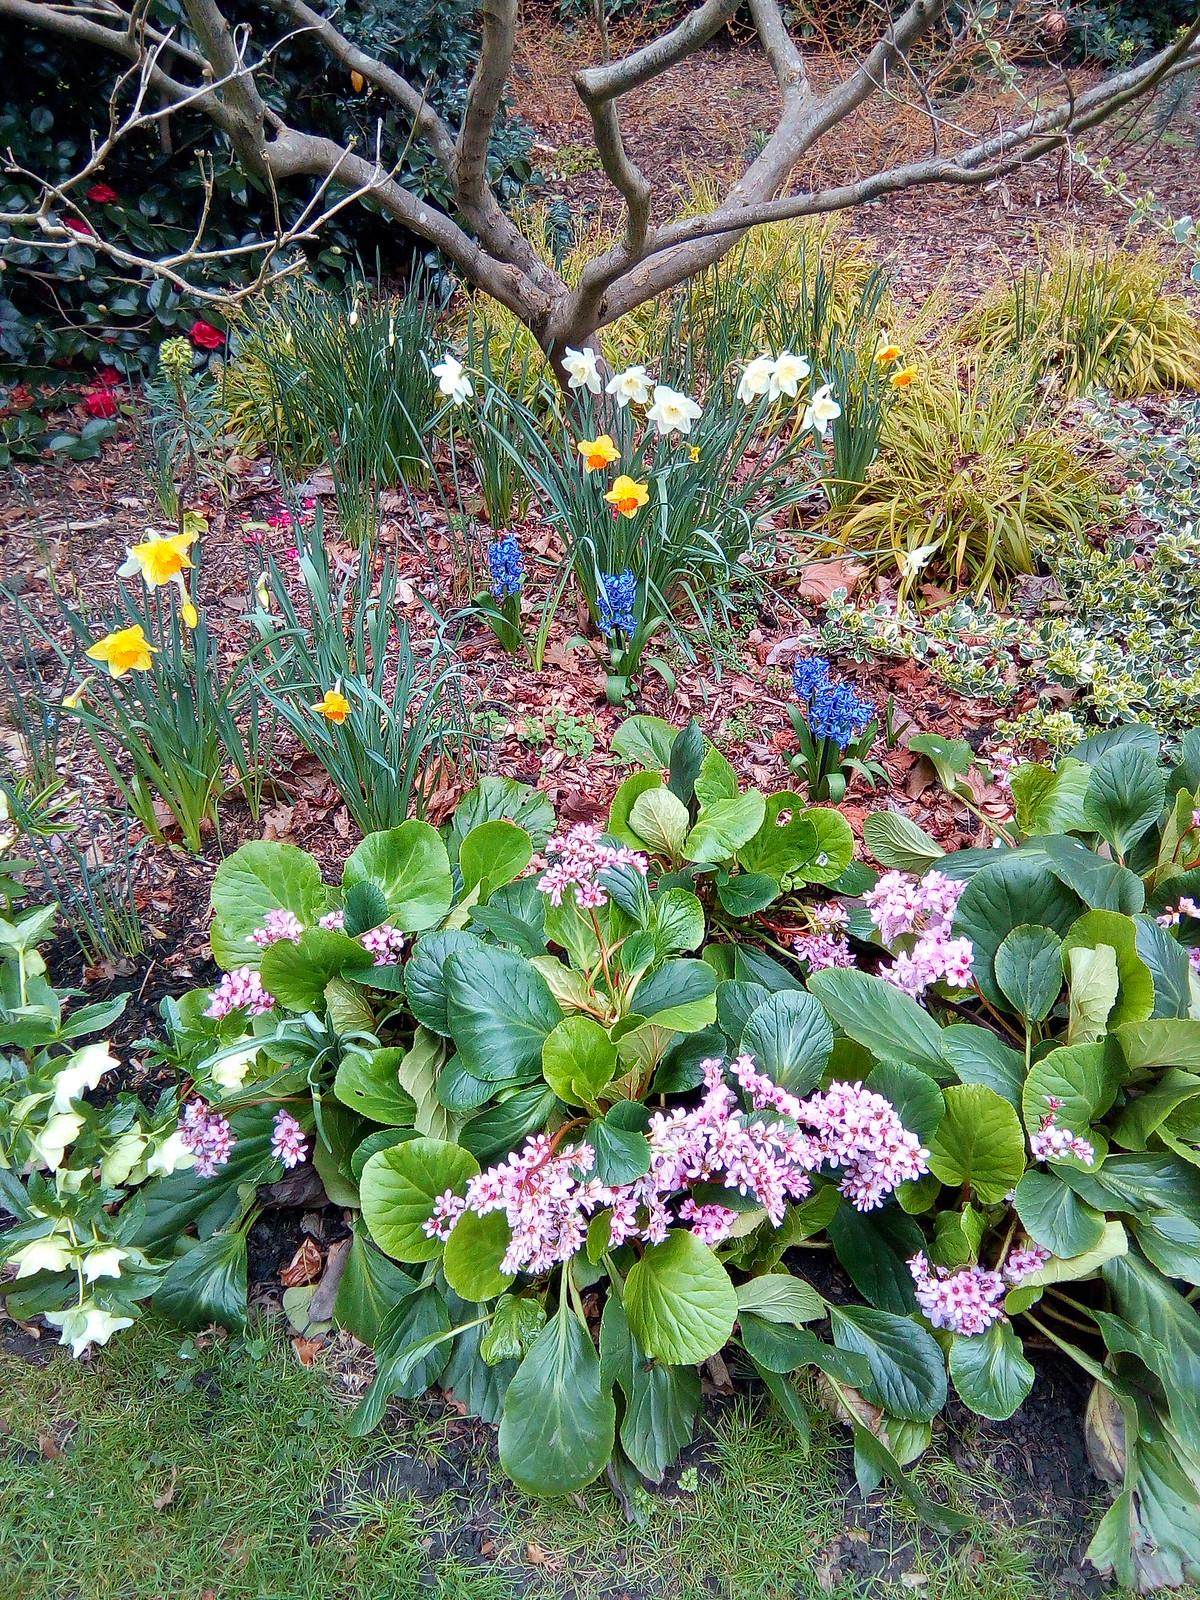 Osterley Park Winter Gardens